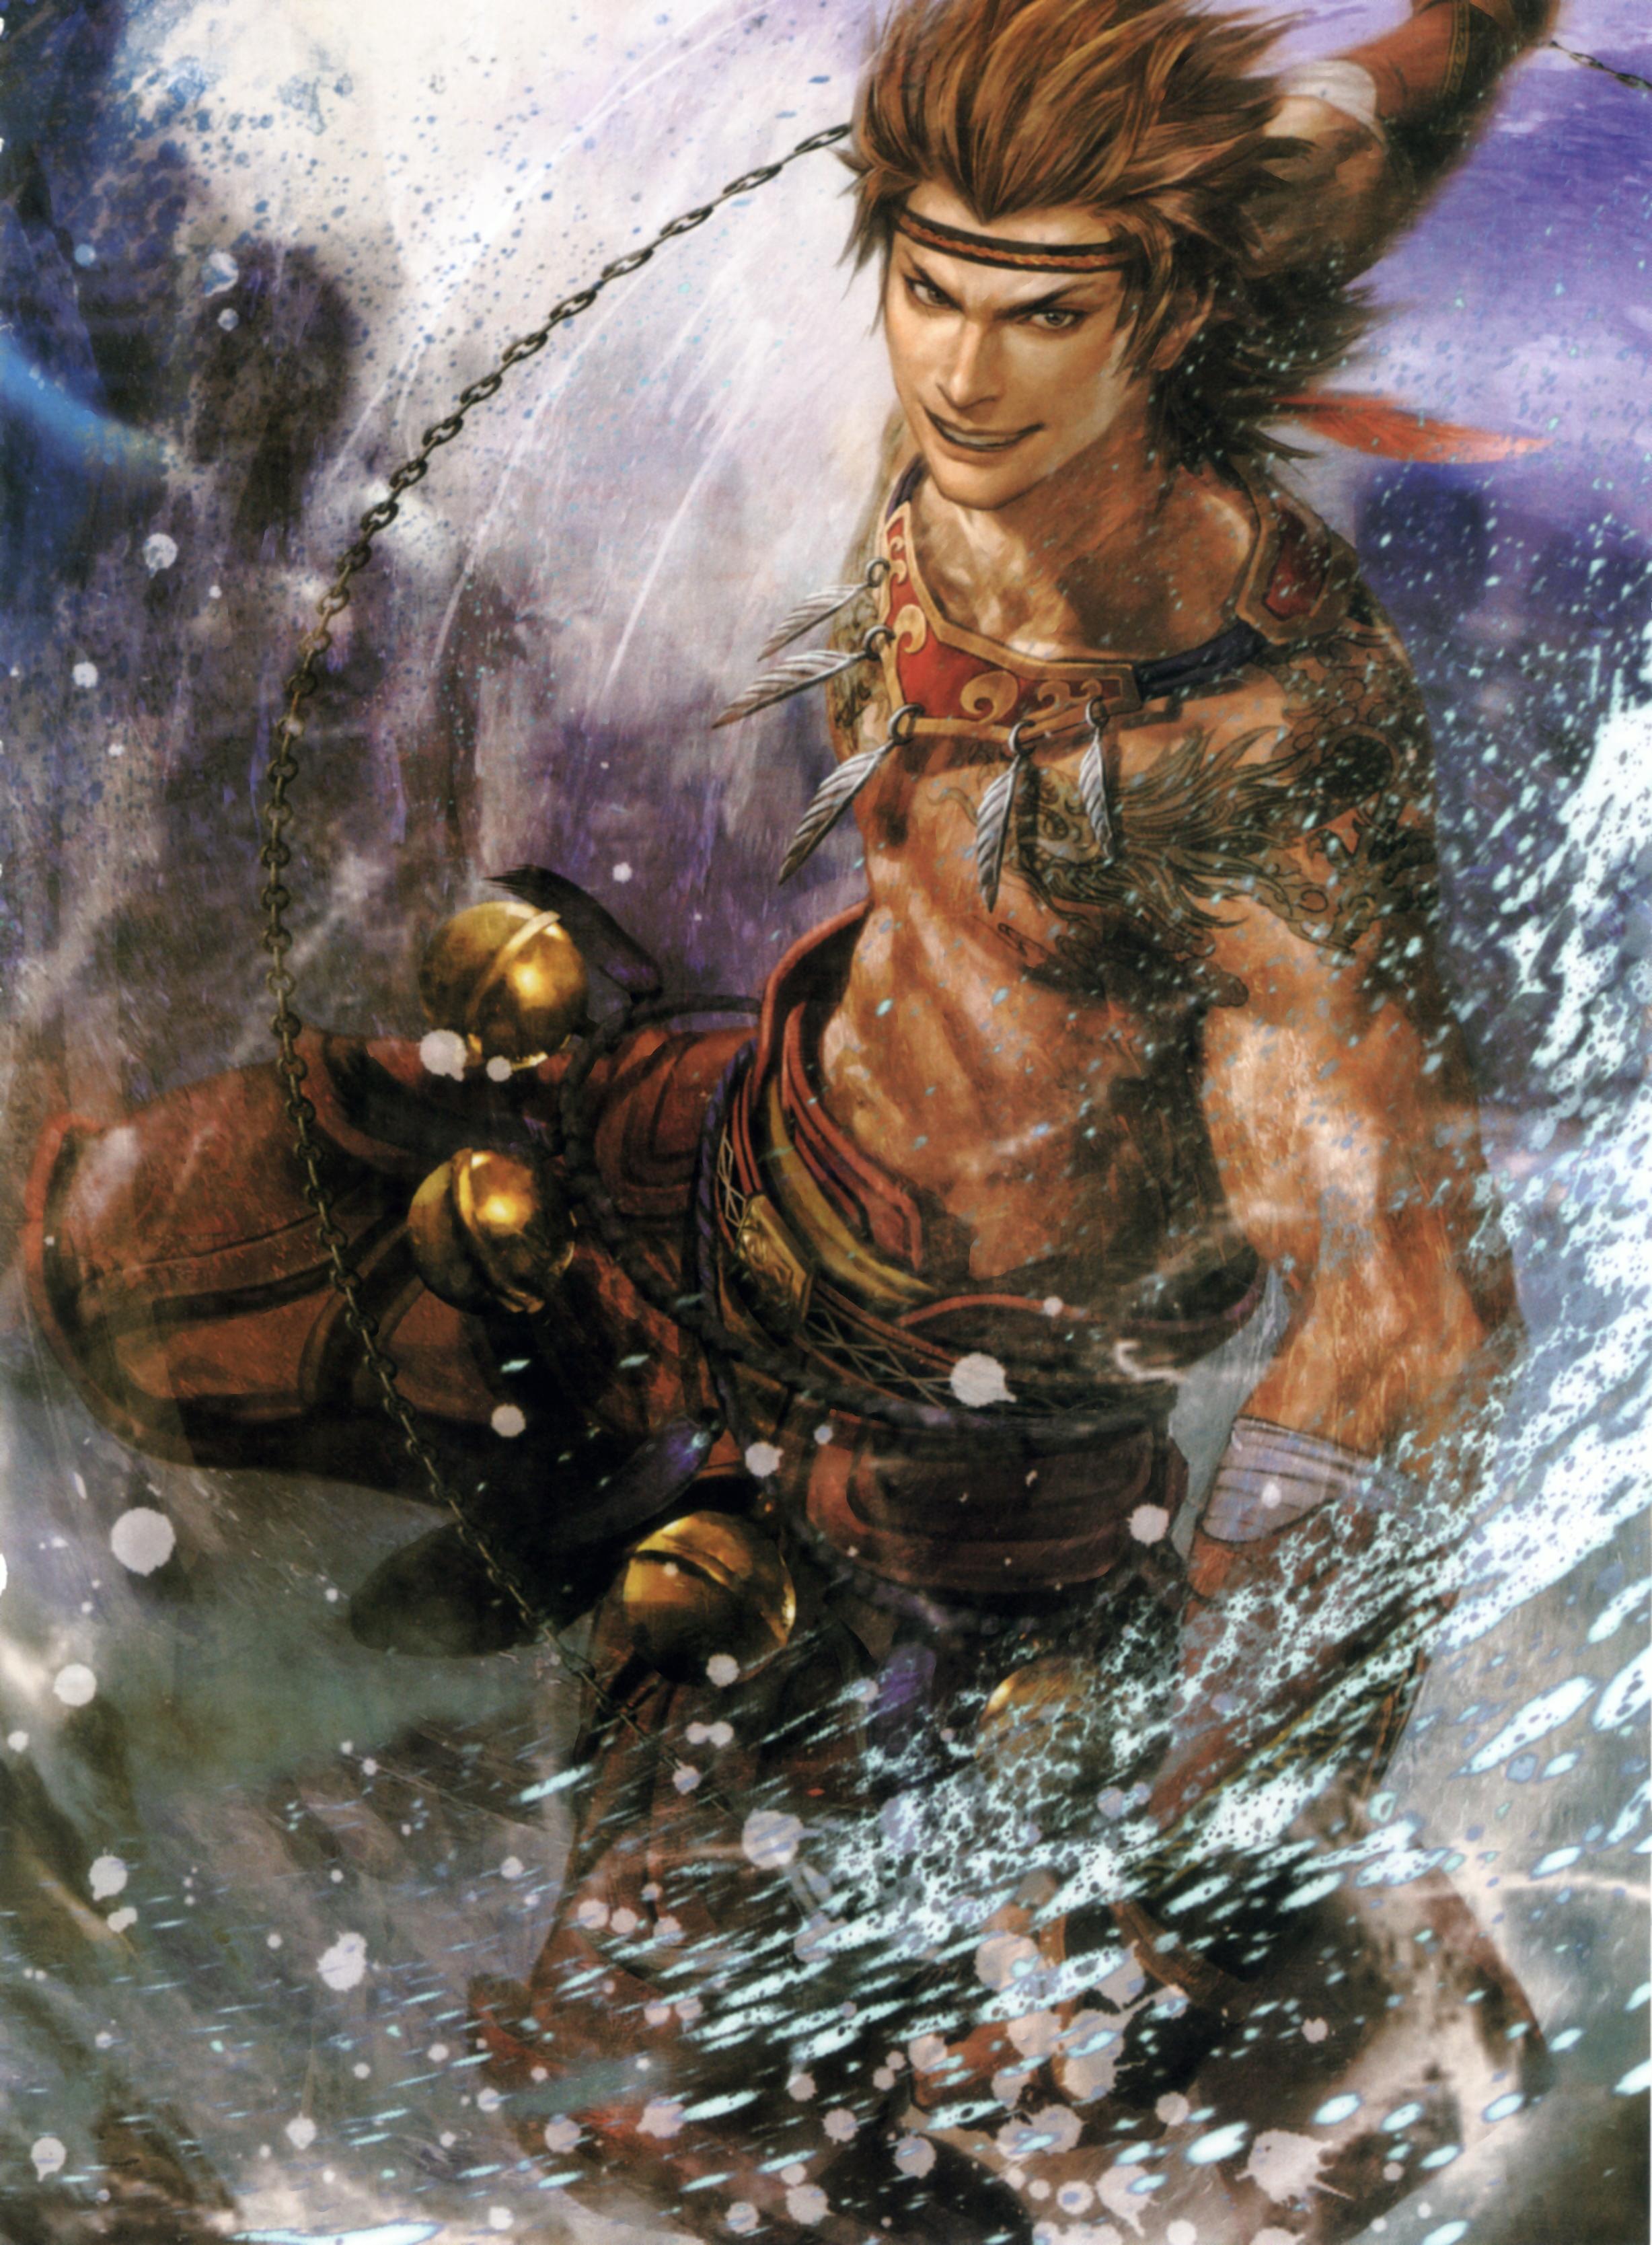 Gan Ning - Dynasty Warriors - Image #1460001 - Zerochan